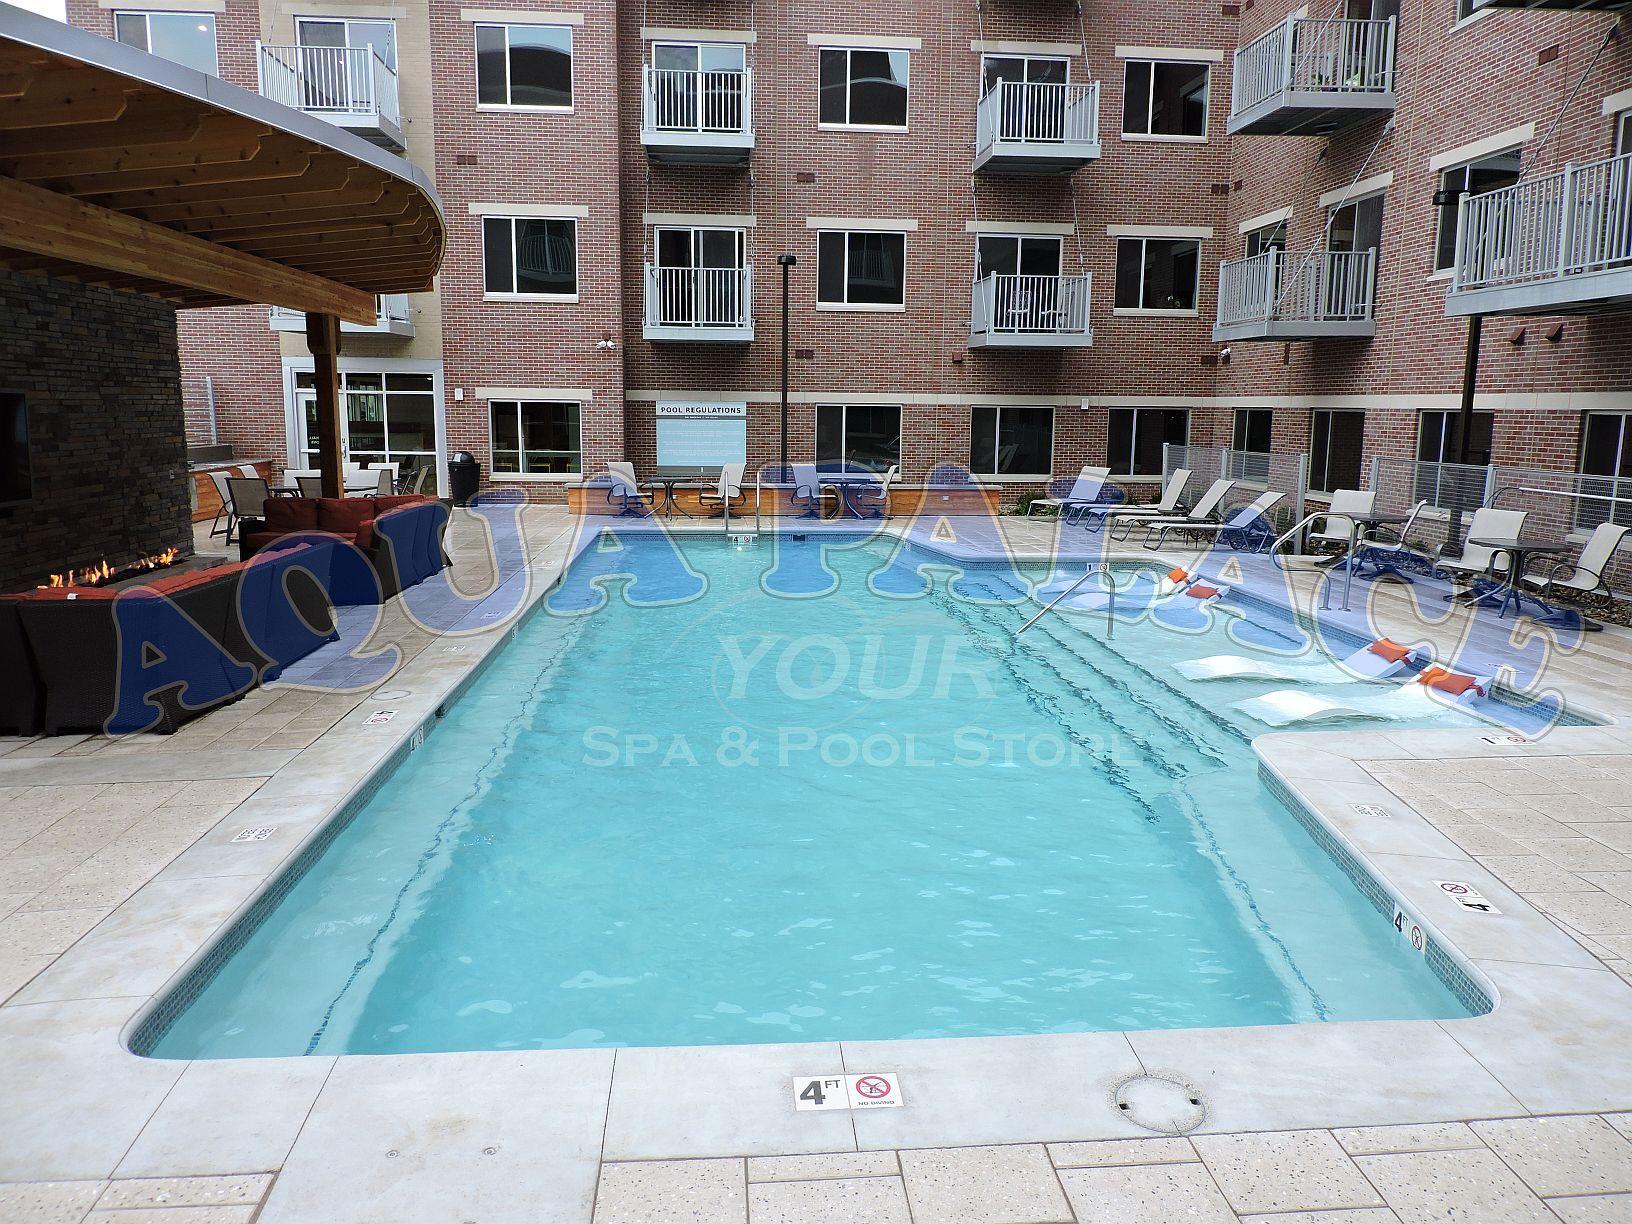 Custom Gunite Swimming Pool In Downtown Omaha Ne Apartment Complex Pool Lighting Tile Wor Custom Swimming Pool Building A Swimming Pool Swimming Pool Designs